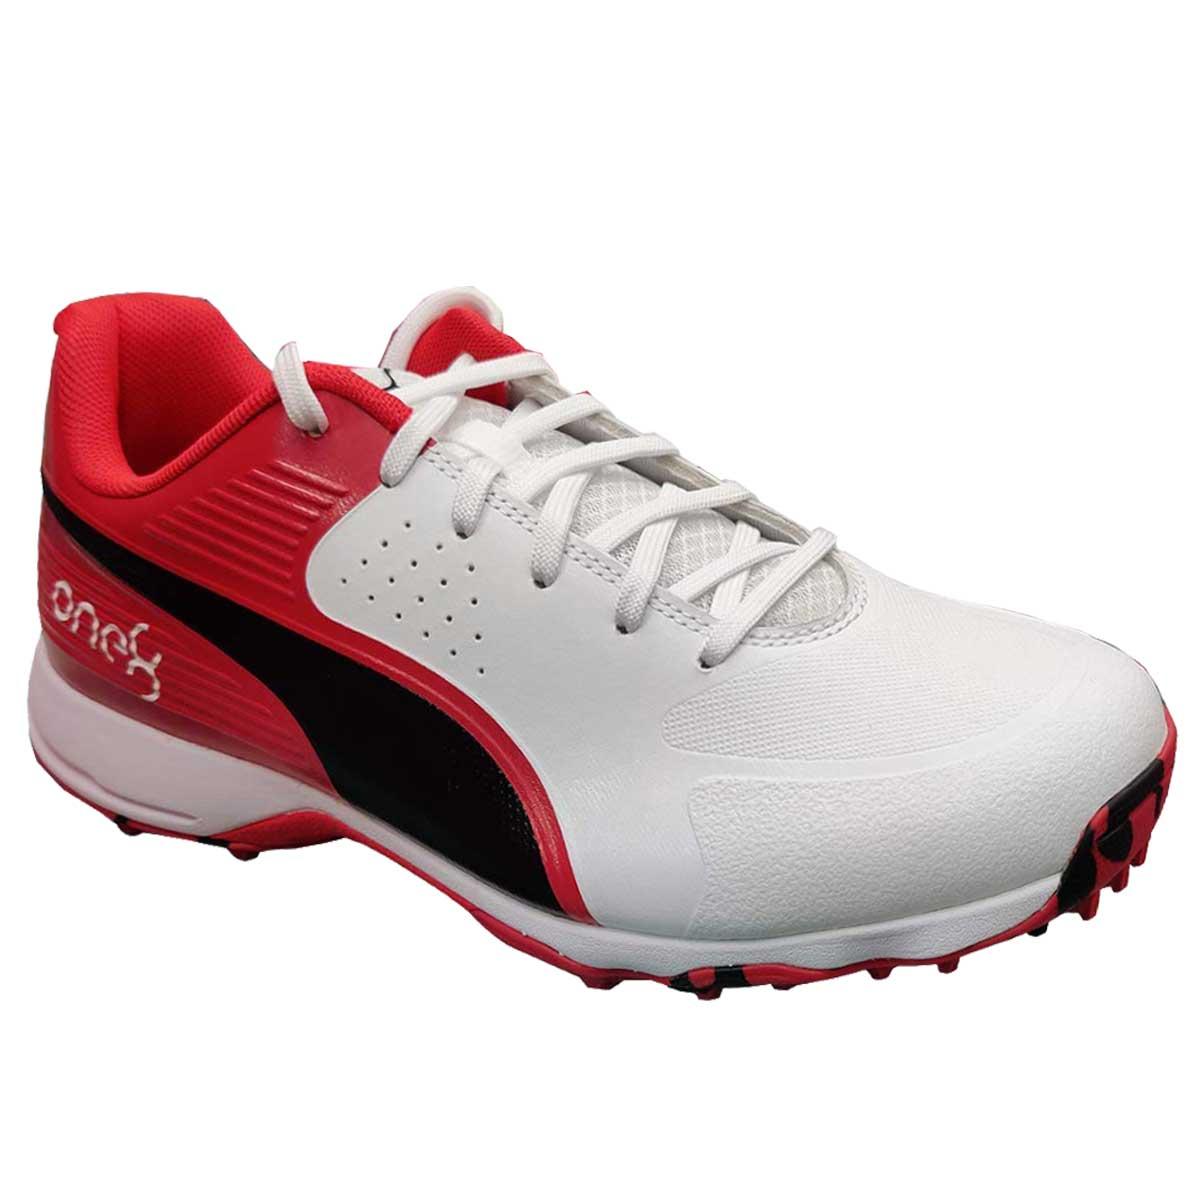 Puma 19 FH Rubber Spike Cricket Shoes